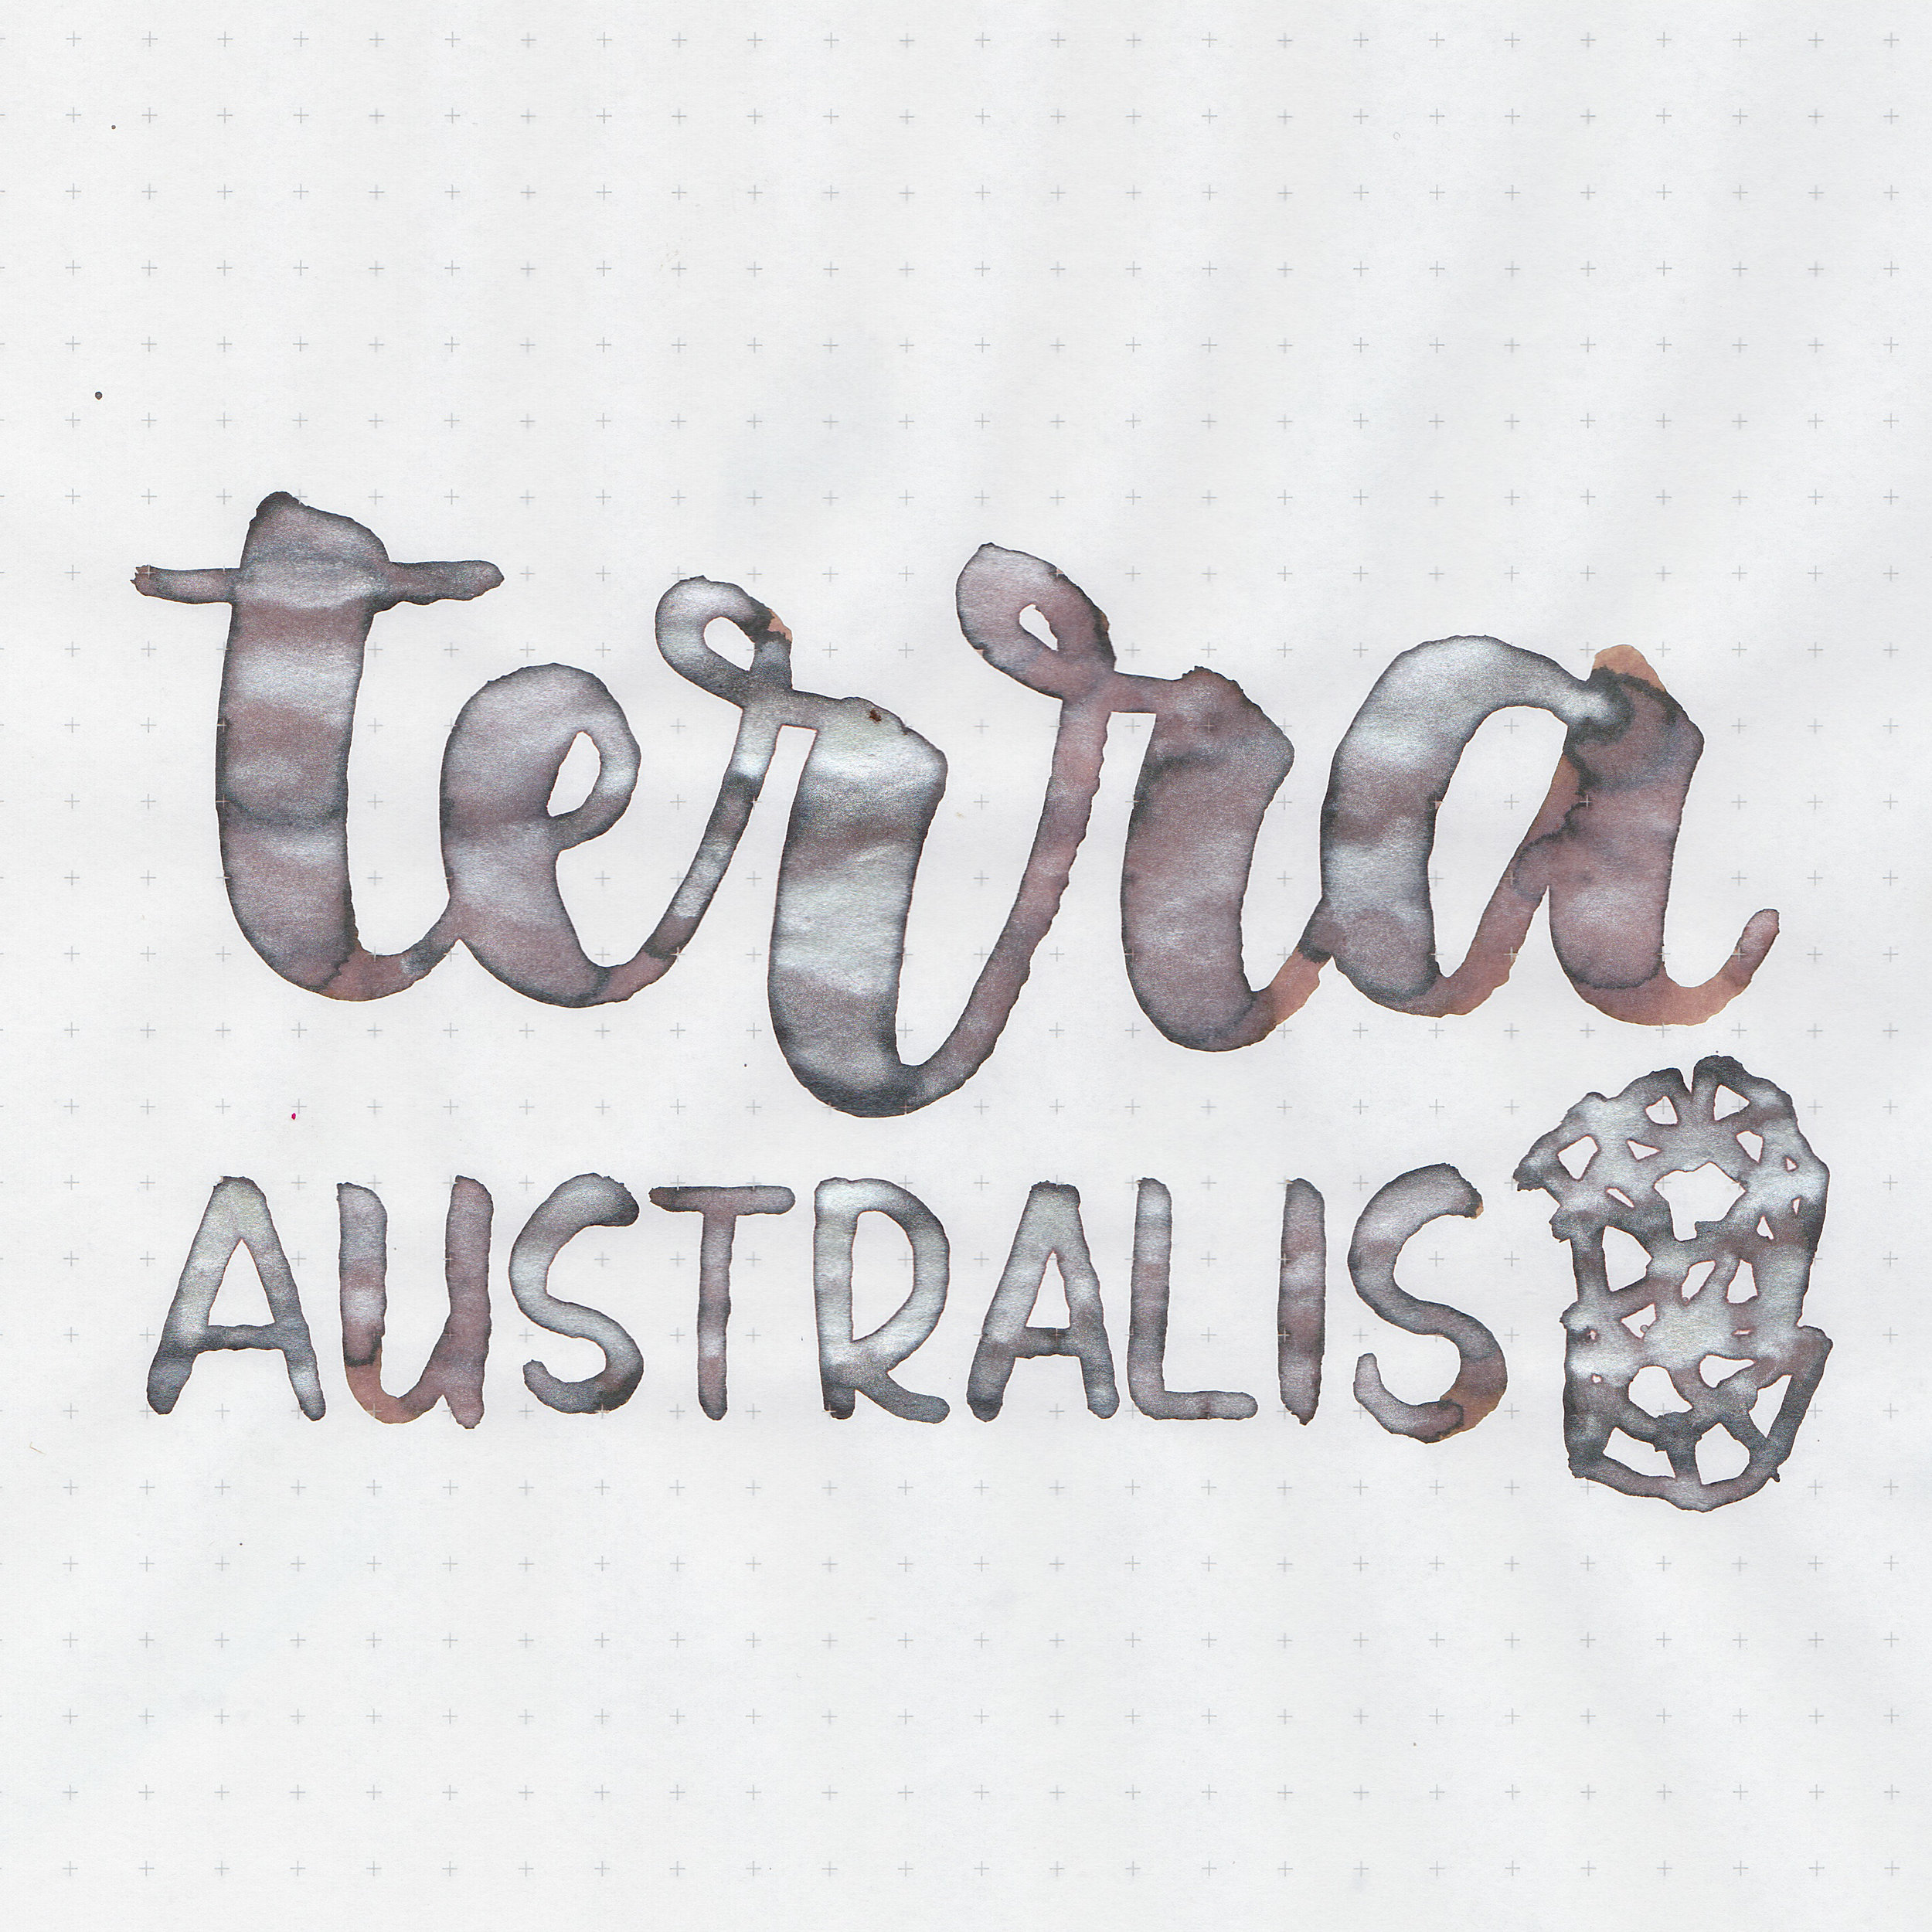 ro-terra-australis-2.jpg